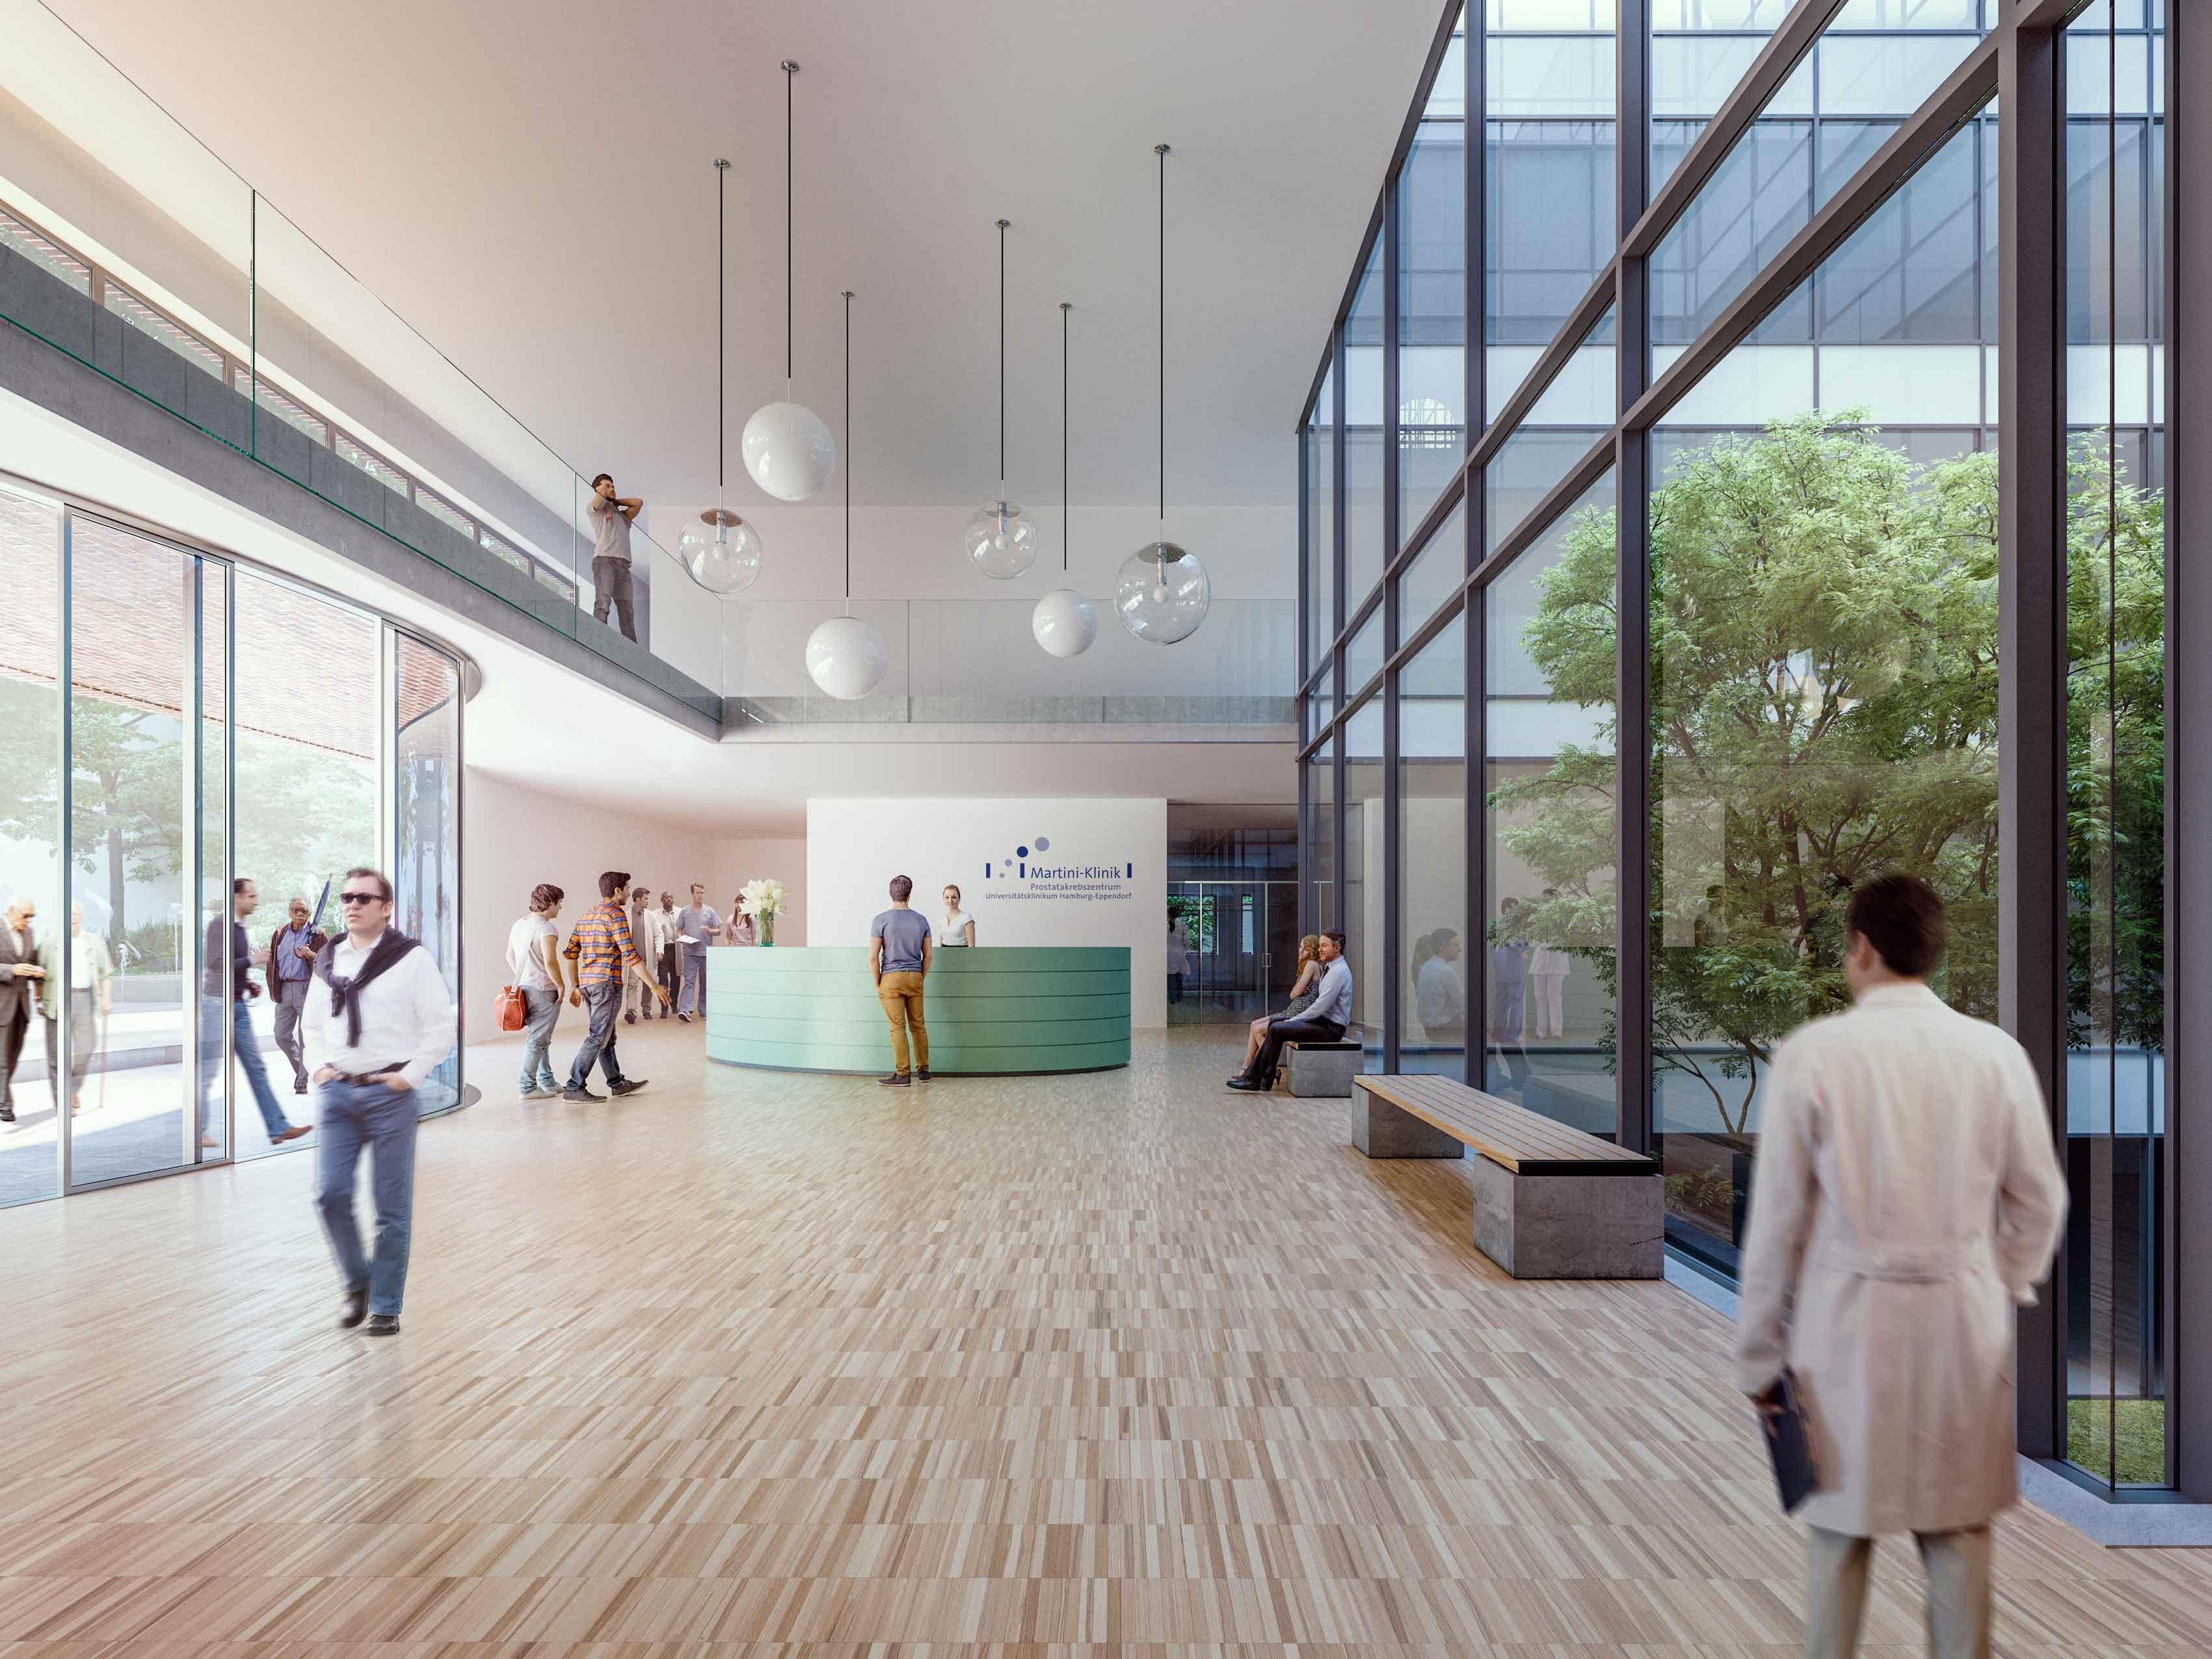 Neubau der Martini-Klinik Rendering Foyer